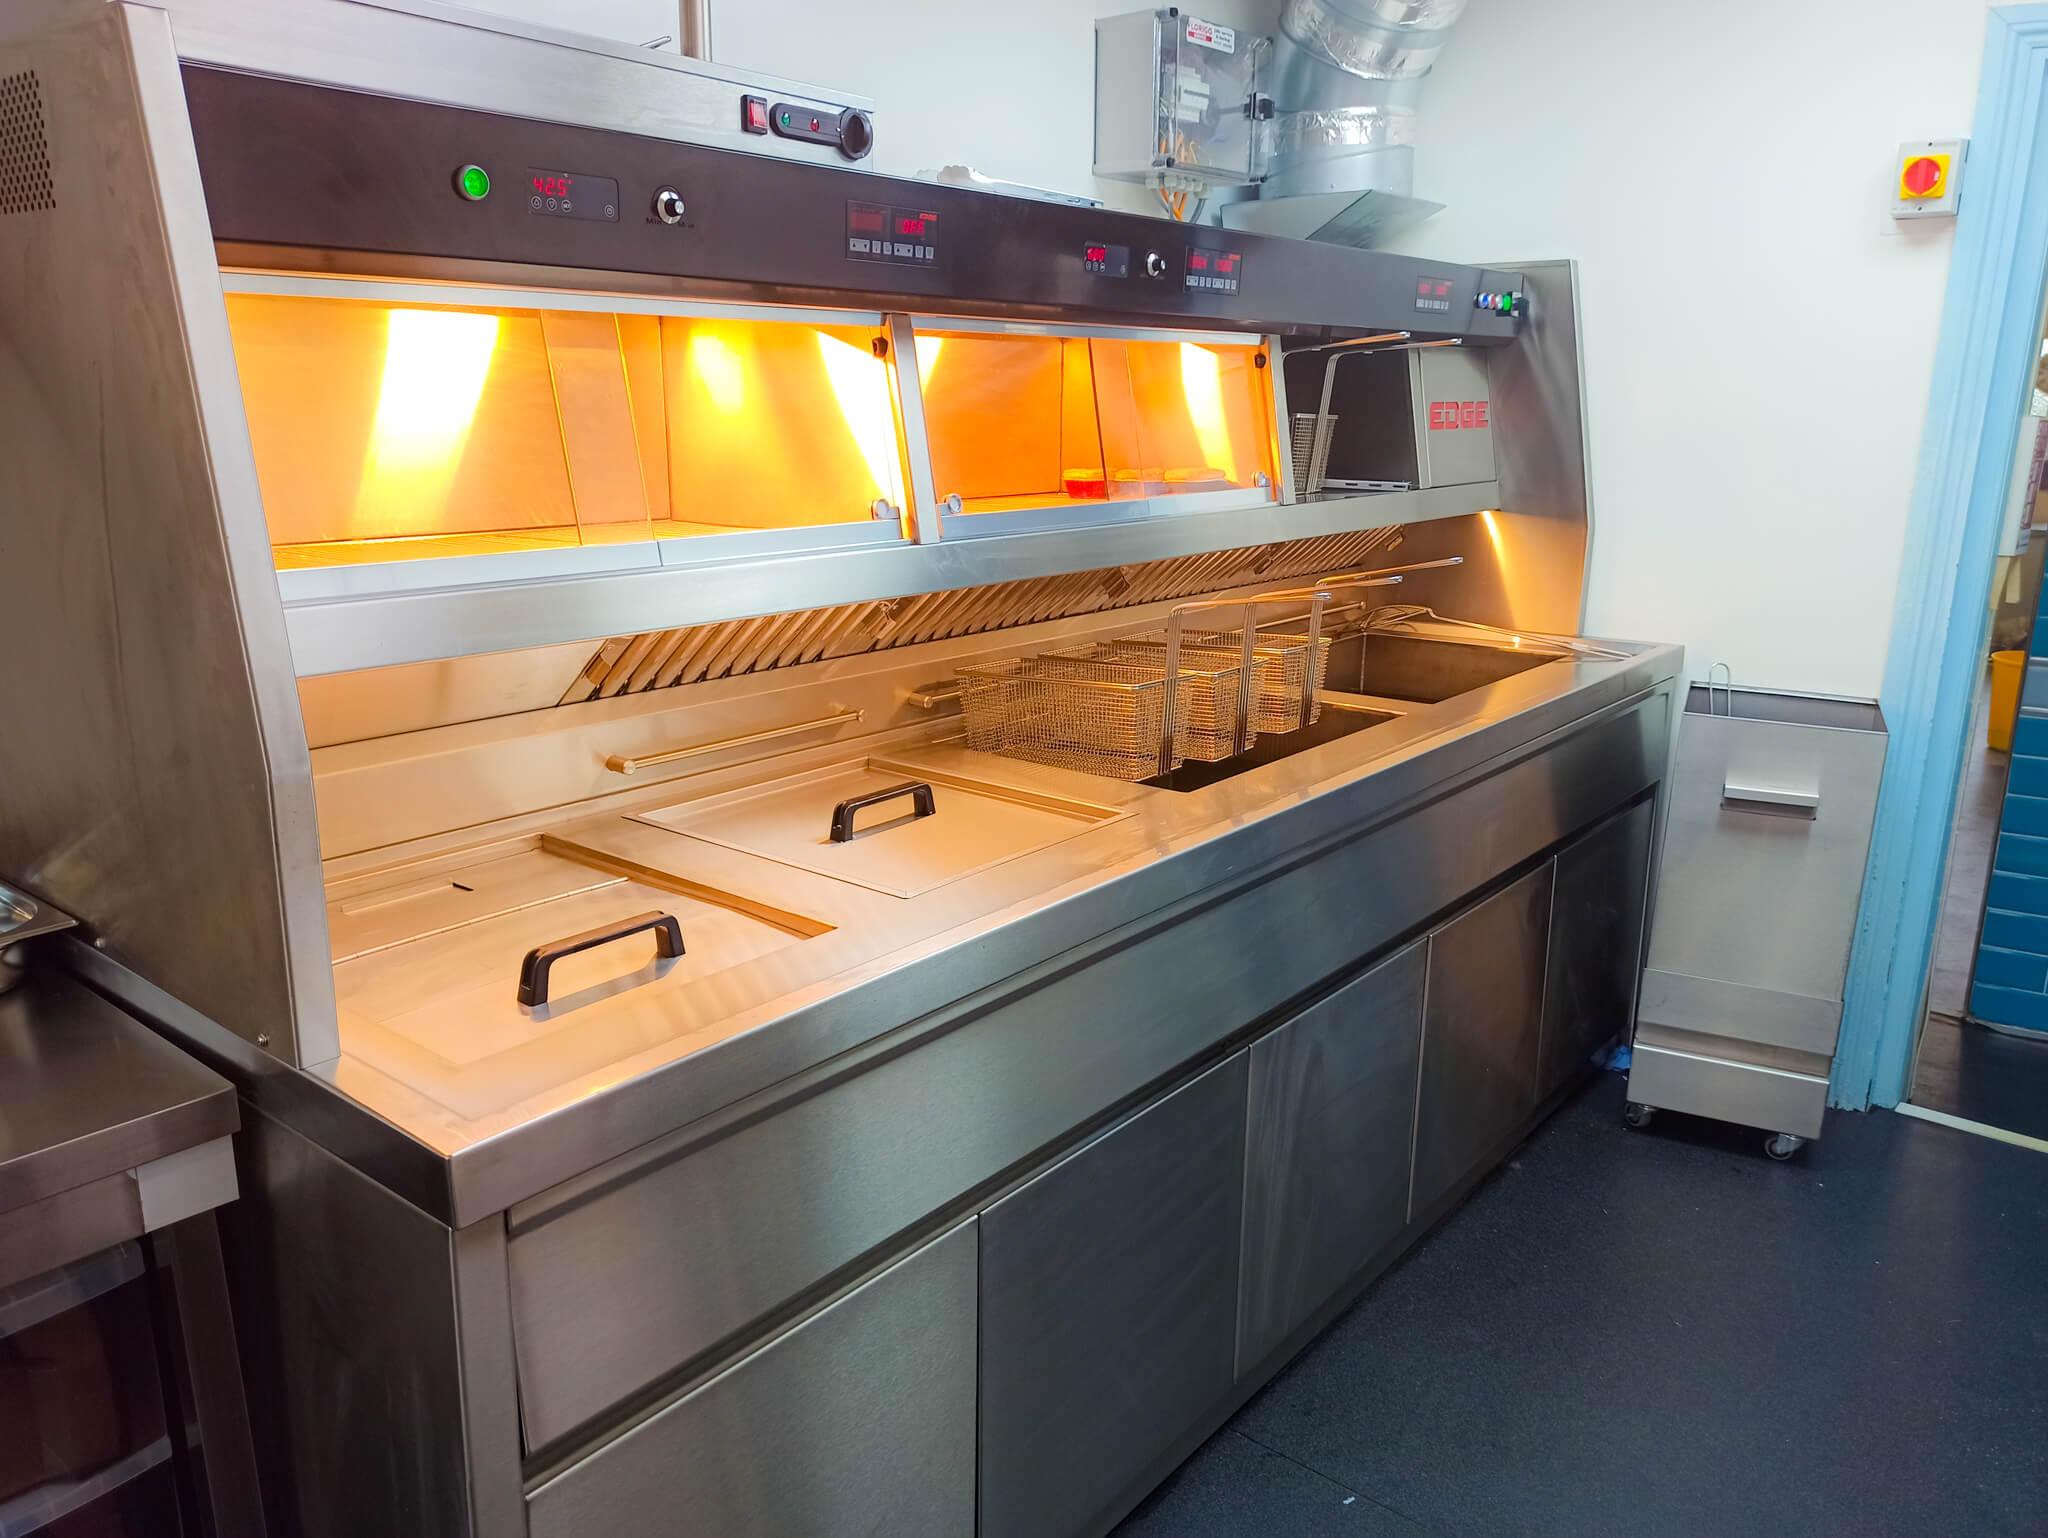 Edge Frying Range - Frying Equipment